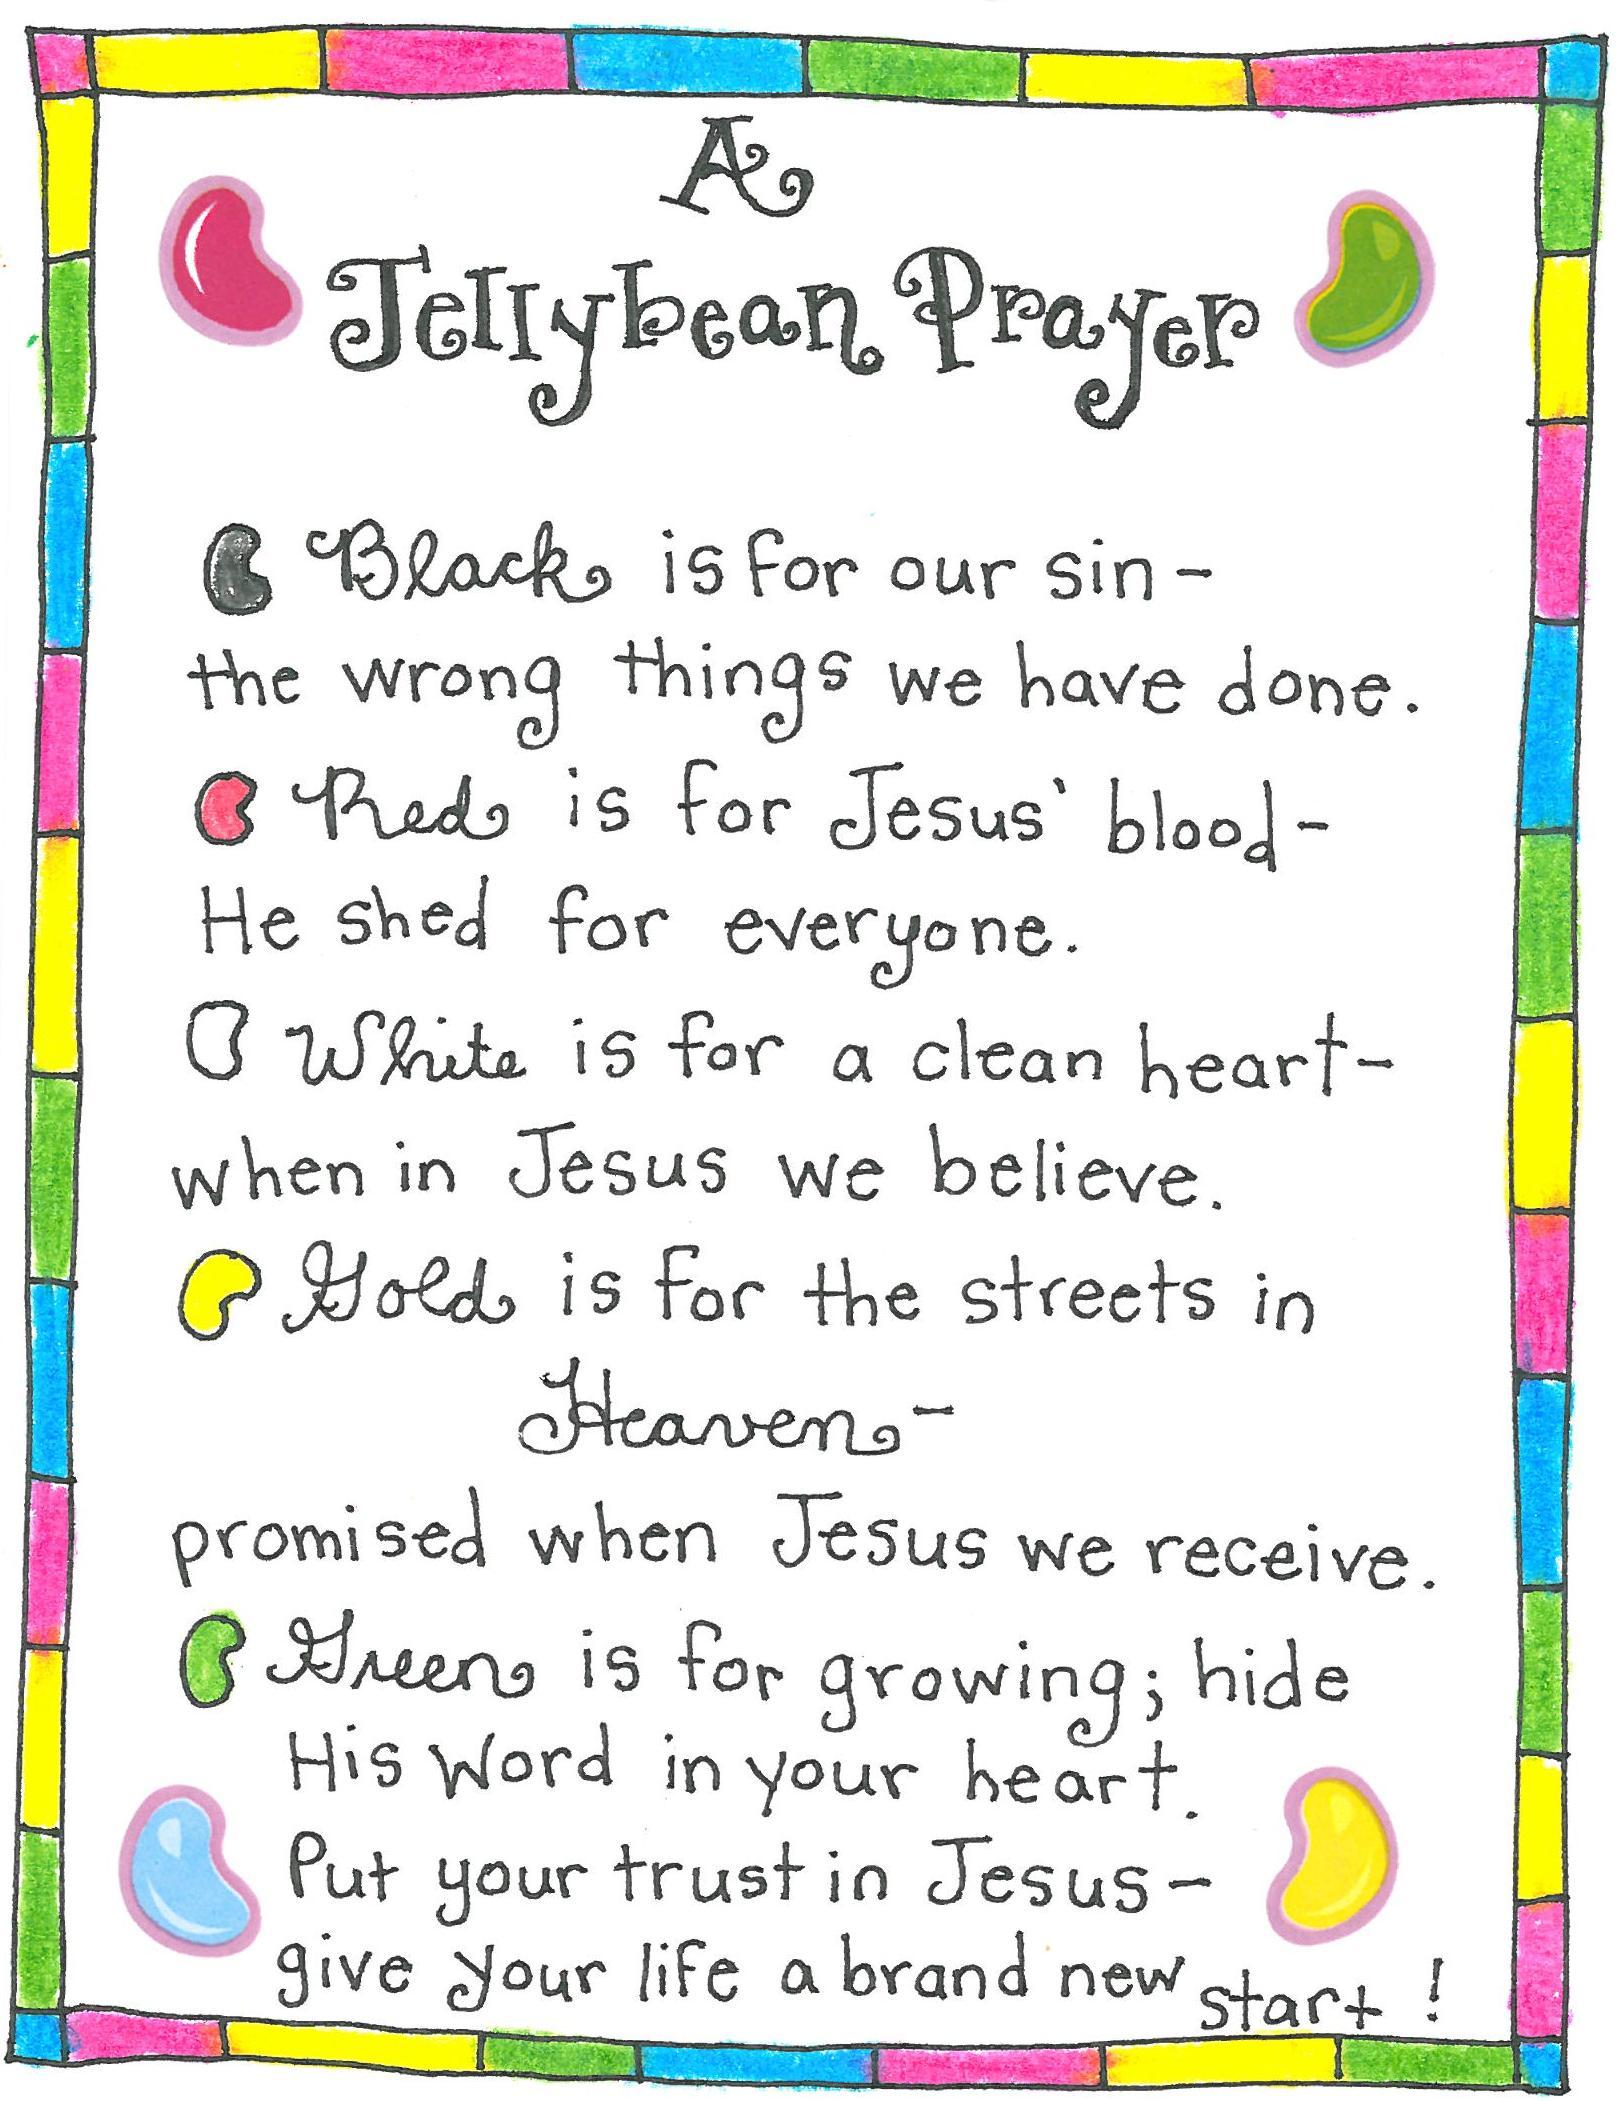 graphic regarding Wordless Book Gospel Printable titled The Jellybean Prayer - No cost Printable! - Pleased Household Fairy